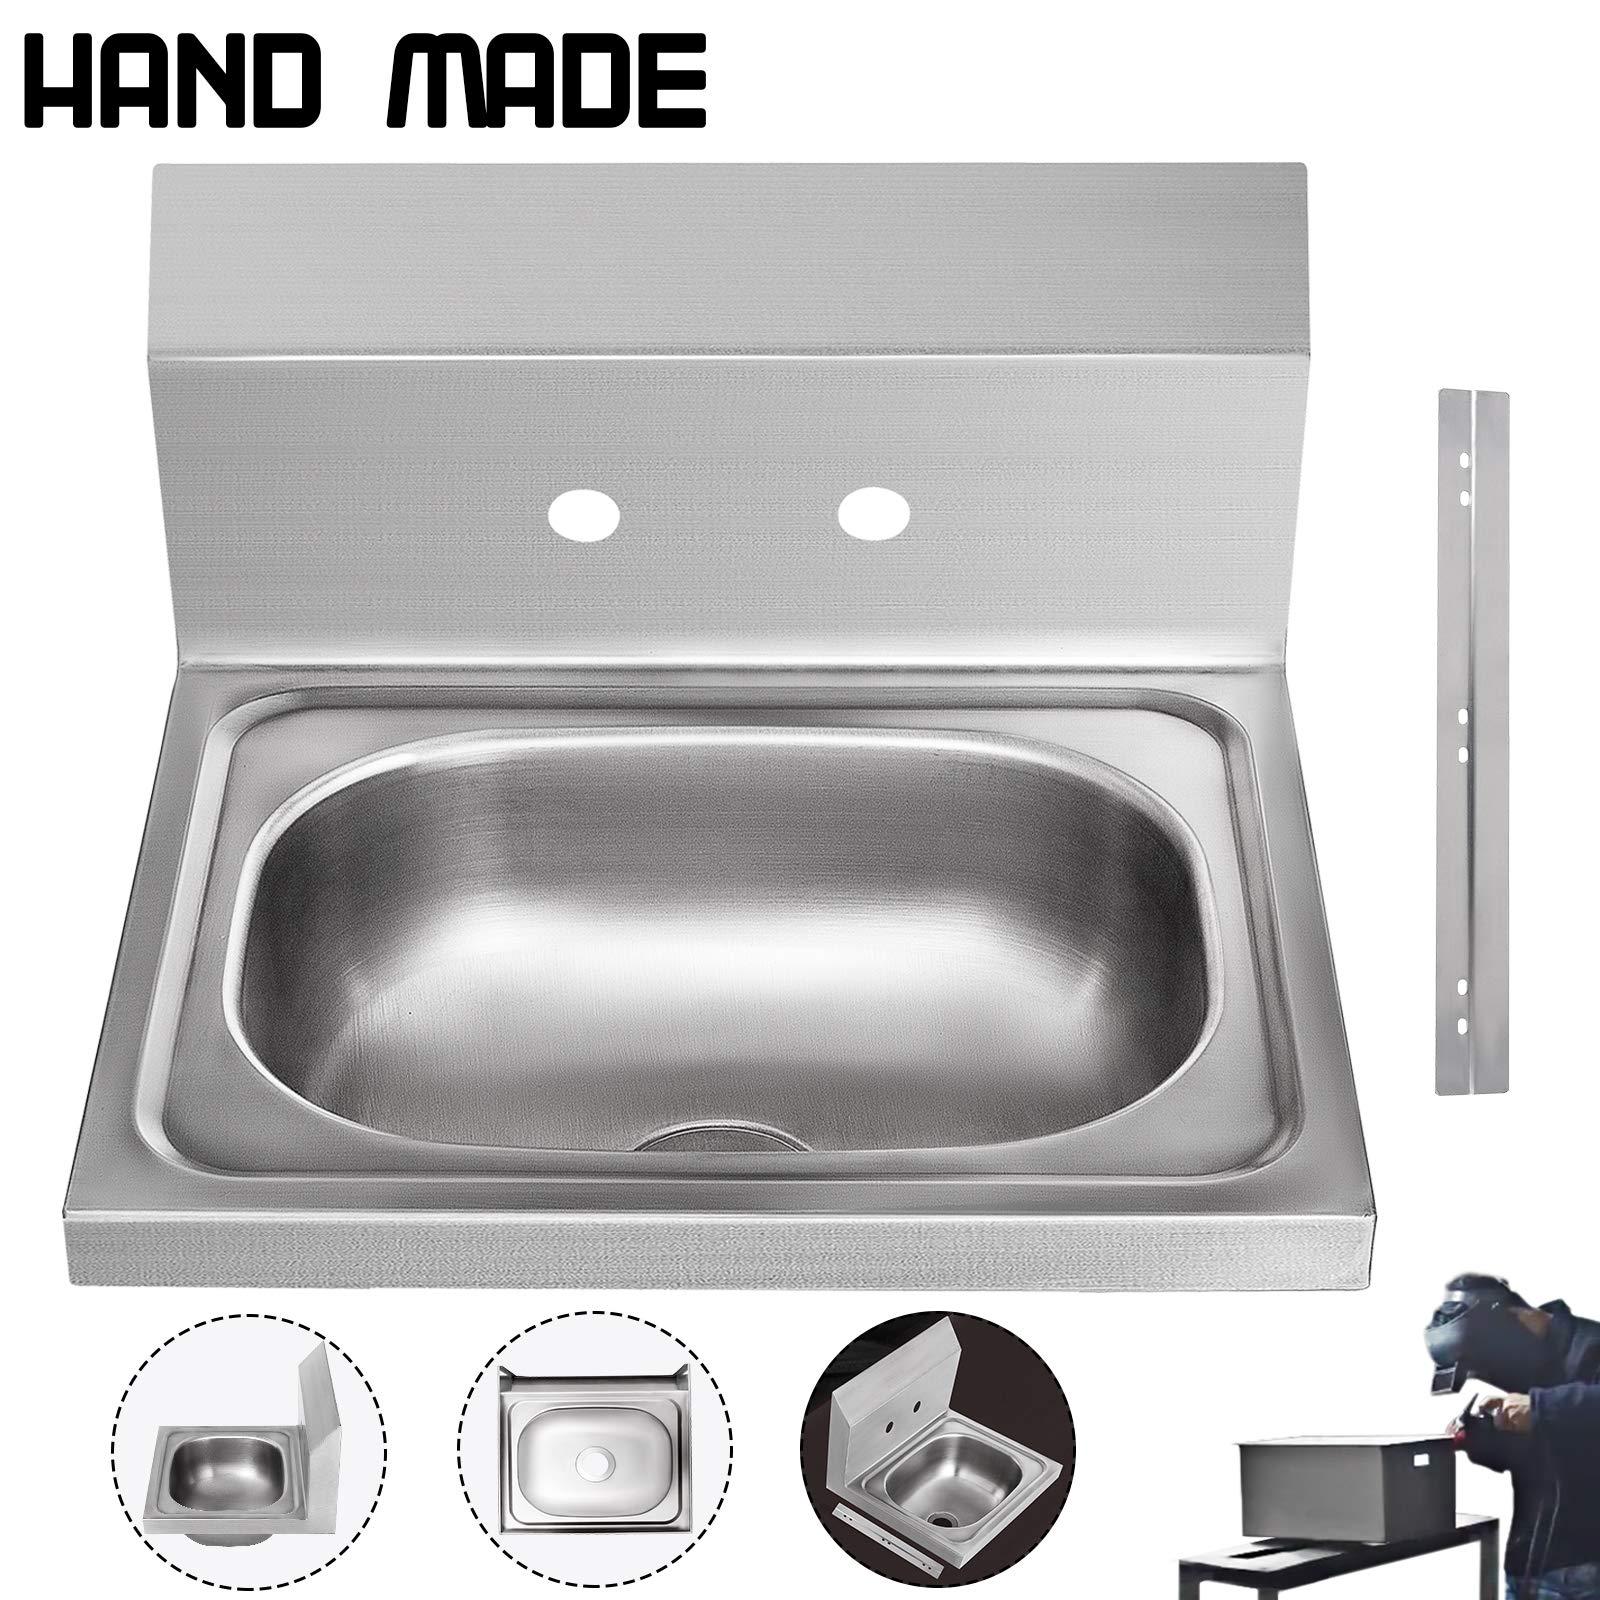 VEVOR Stainless Steel Sink with Backsplash Undermount Bowl Kitchen Sink Hand made Wall Mount Hand Washing Basin